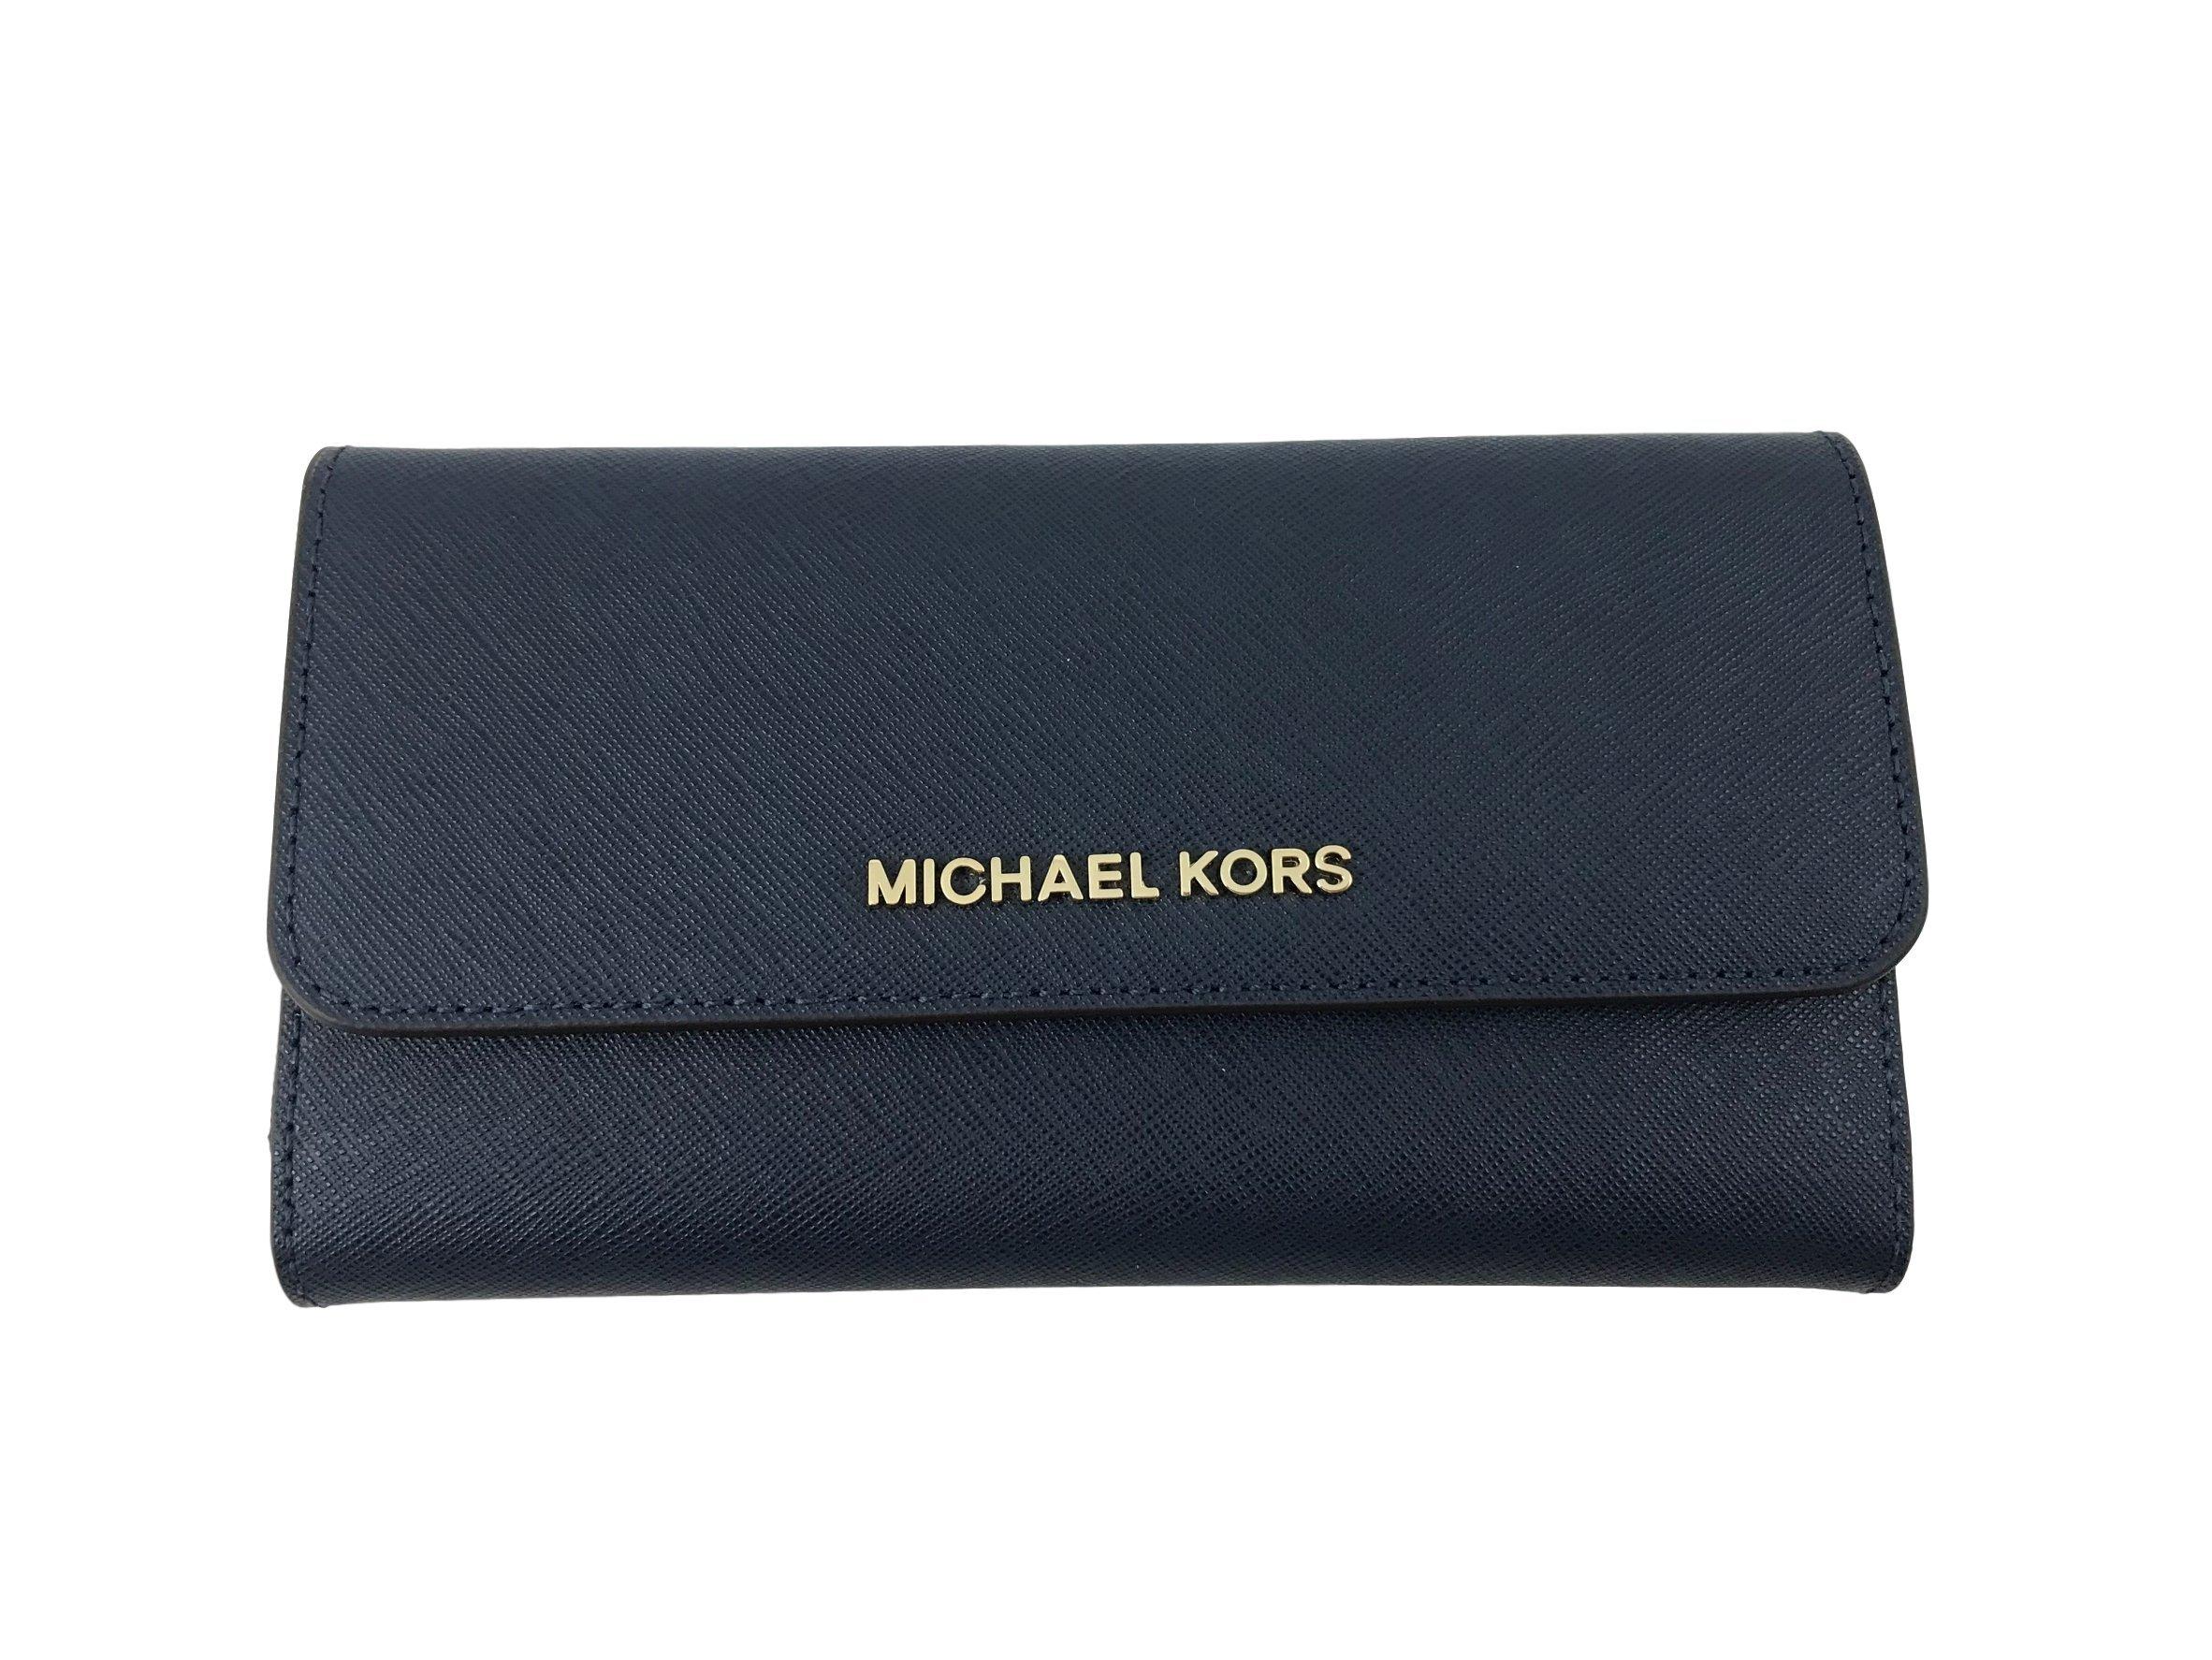 Michael Kors Jet Set Travel Large Trifold Leather Wallet (Navy)